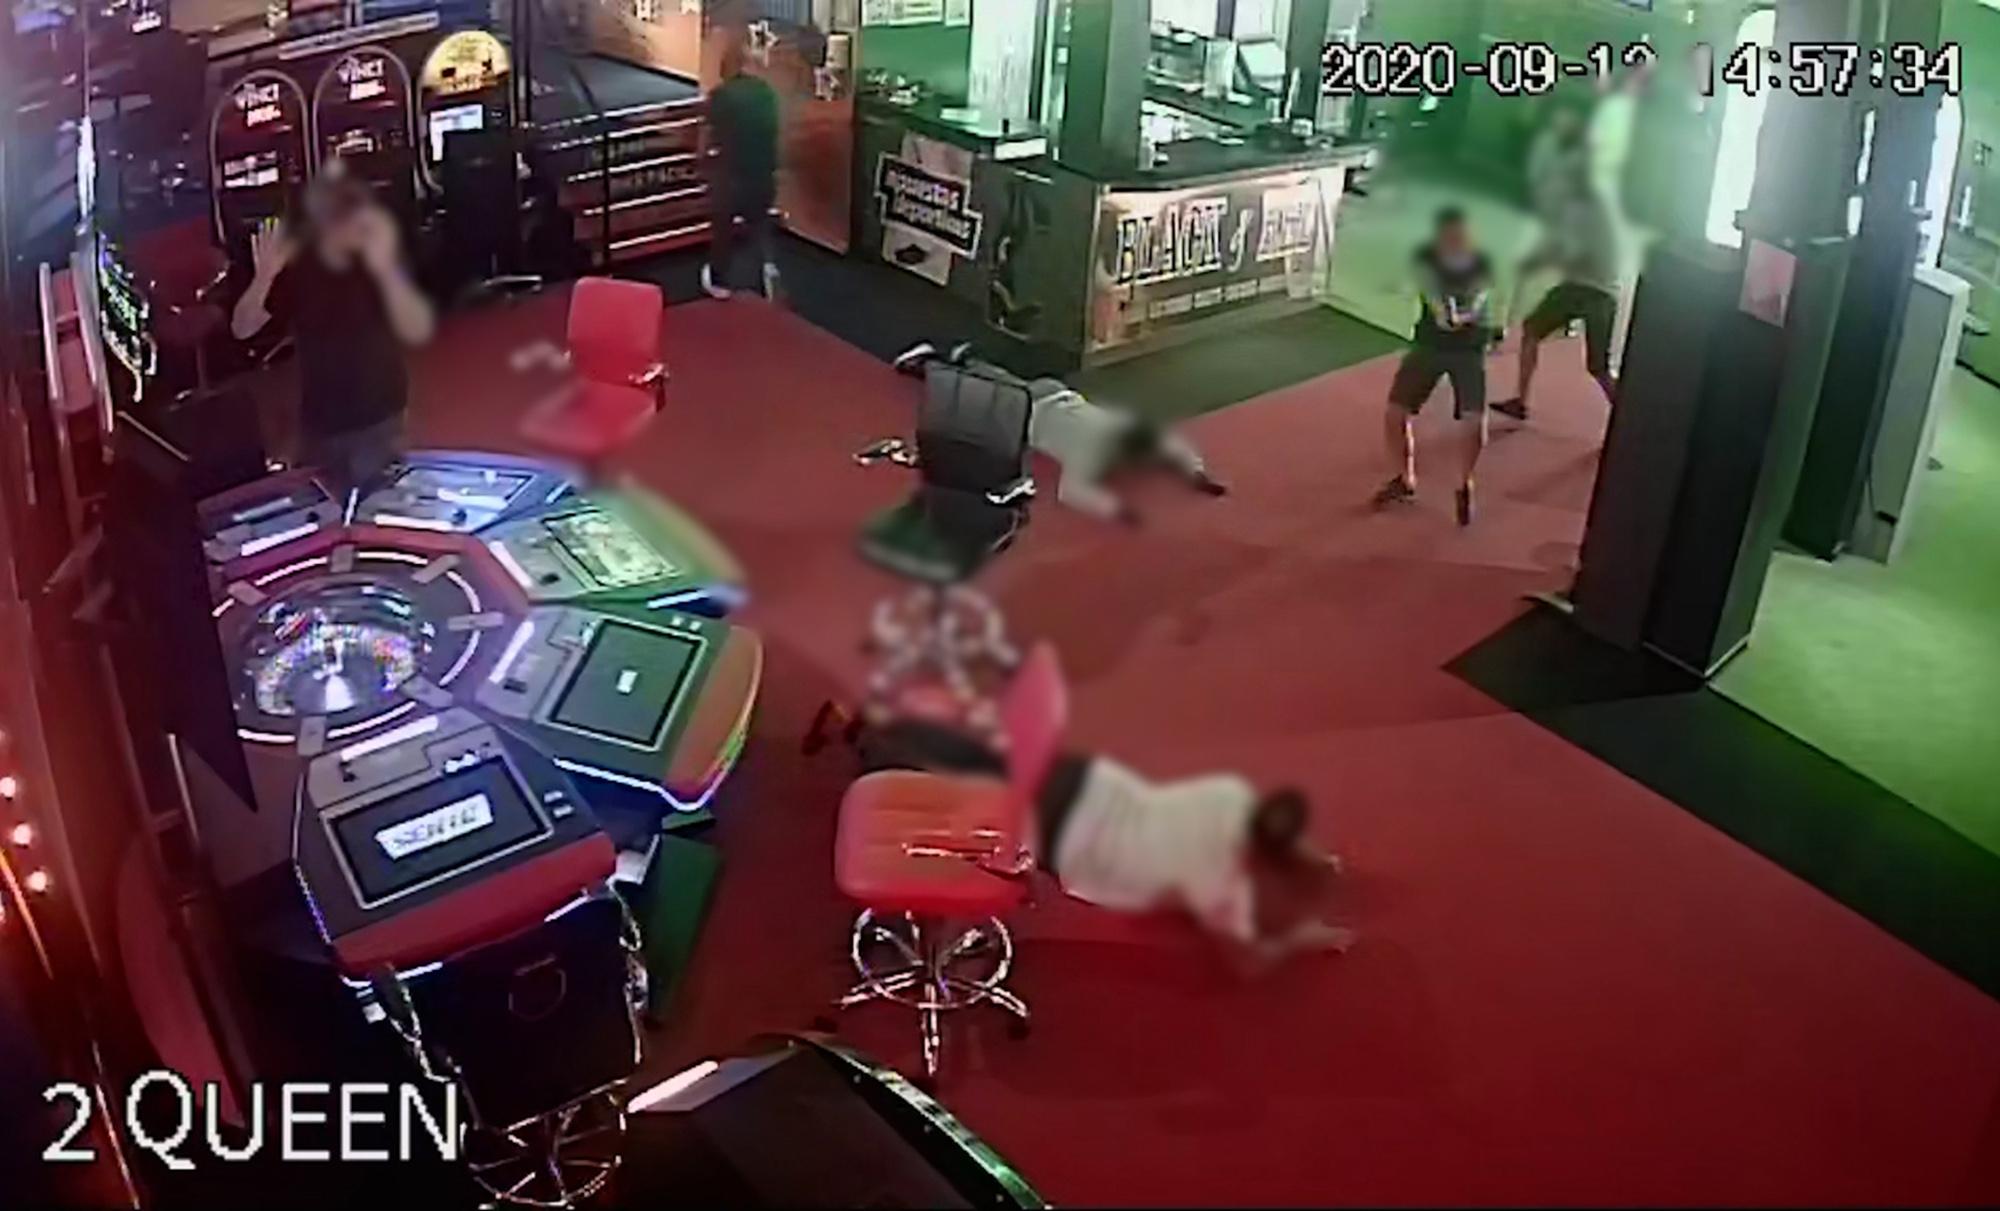 Spanish Police Nab Casino-Robbing Gang Mid-Heist